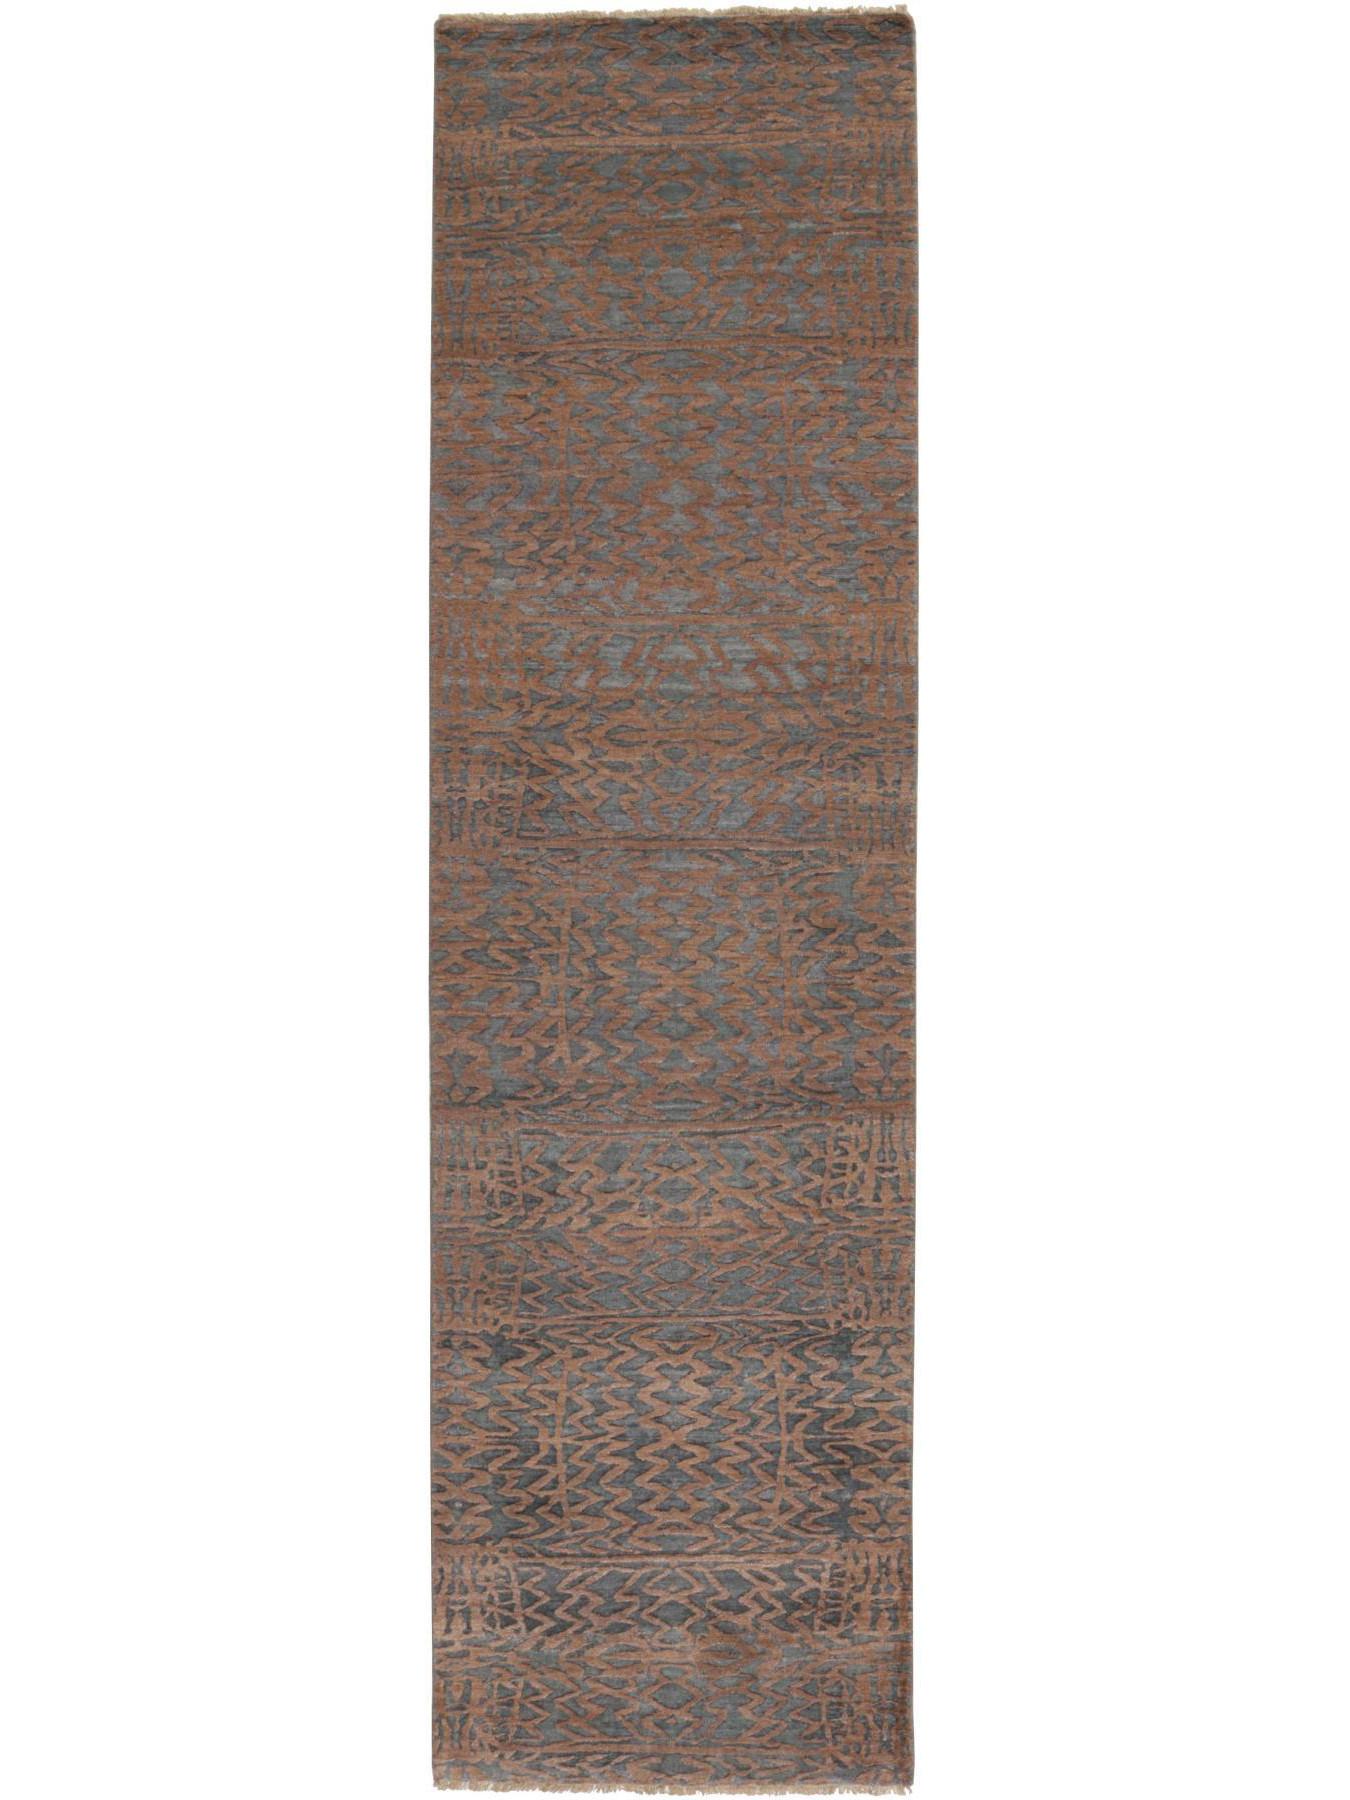 Luxury tapijten - Damask-AL-417 HB-6/HB-19